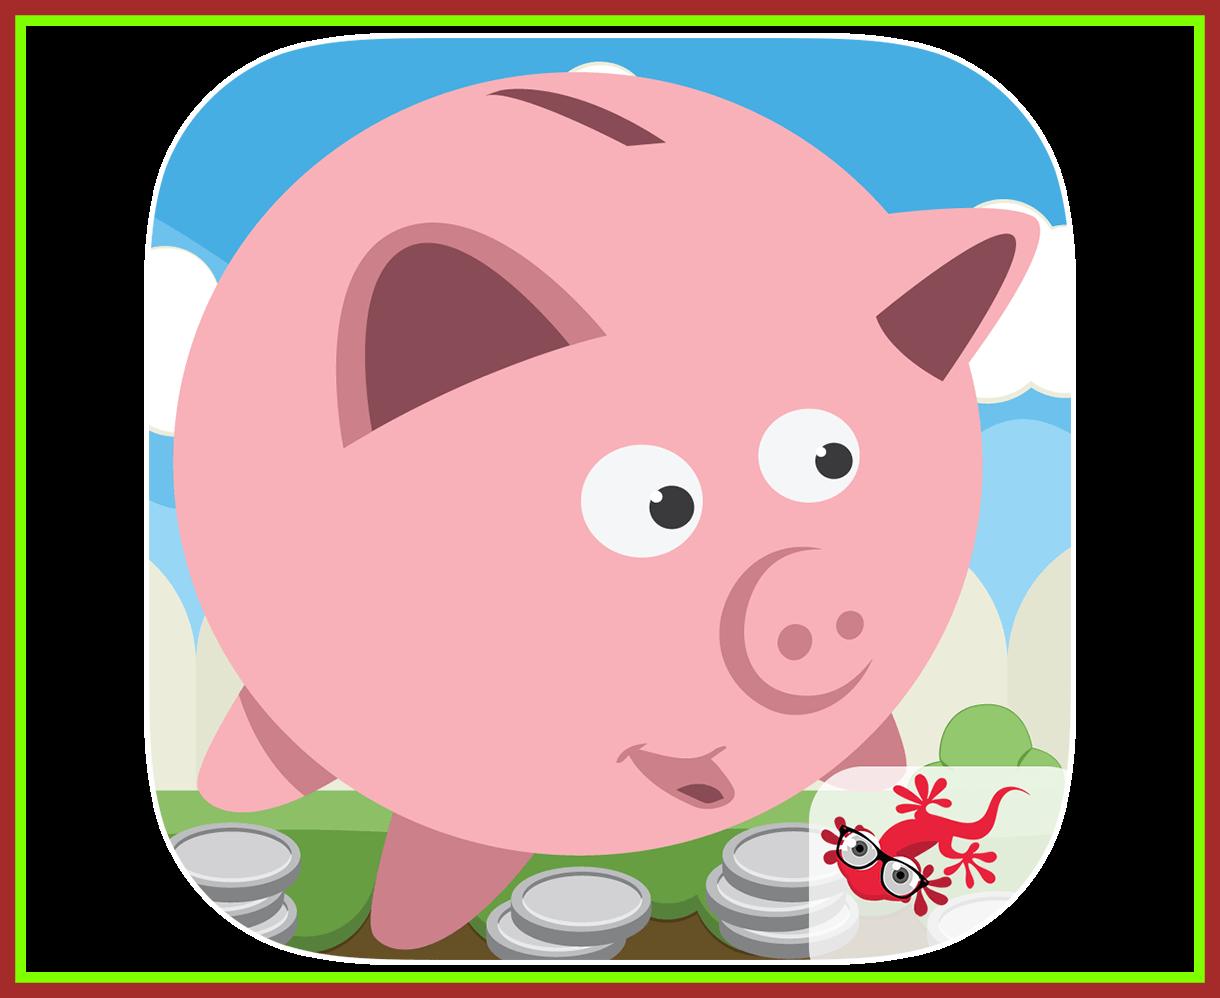 Money management clipart clip art royalty free Incredible Piggy Bank Clip Art Money Bag Png Of Clipart Style And ... clip art royalty free